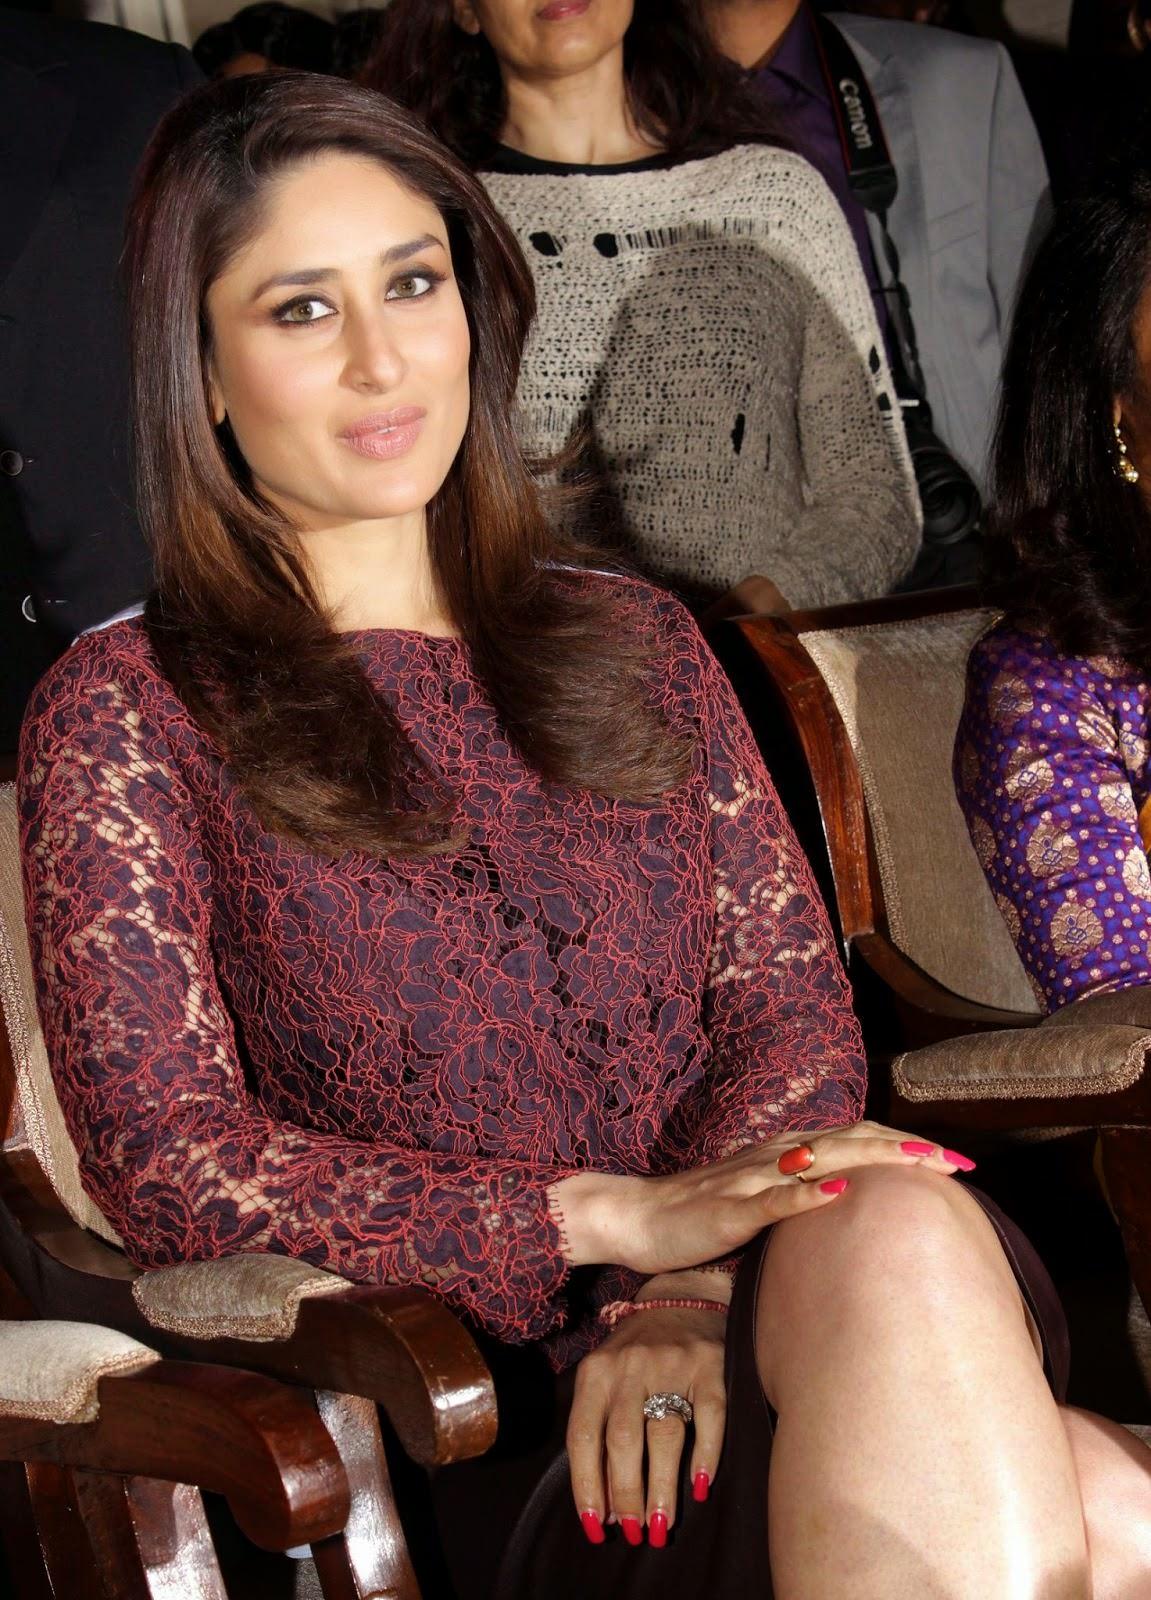 БЕБО - Карина Капур / Kareena Kapoor - Страница 16 88047799a8c440e8a8ba76831694628bdaf63654984afb1a8df7be41708e8f8eede2b822